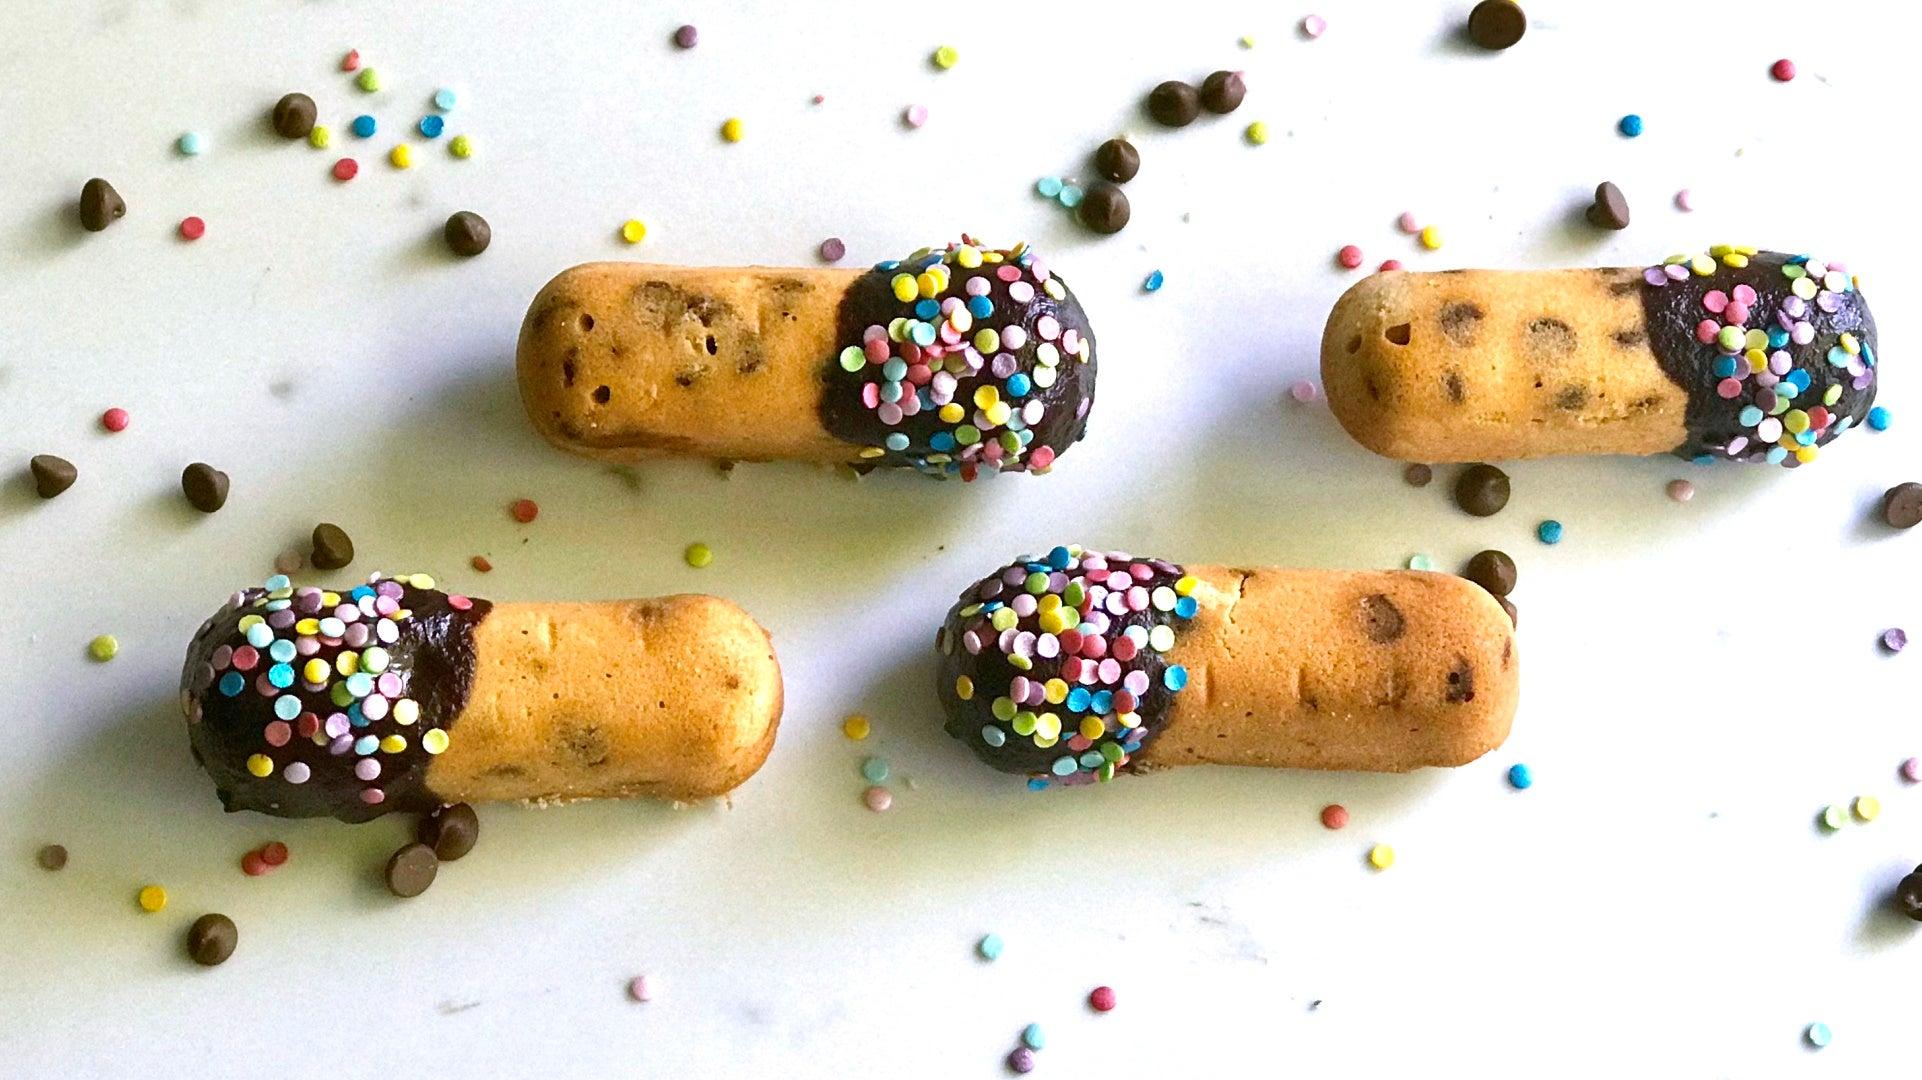 Chocolate-Chip-Twinkies-Alternative-Image_HEADER.jpg